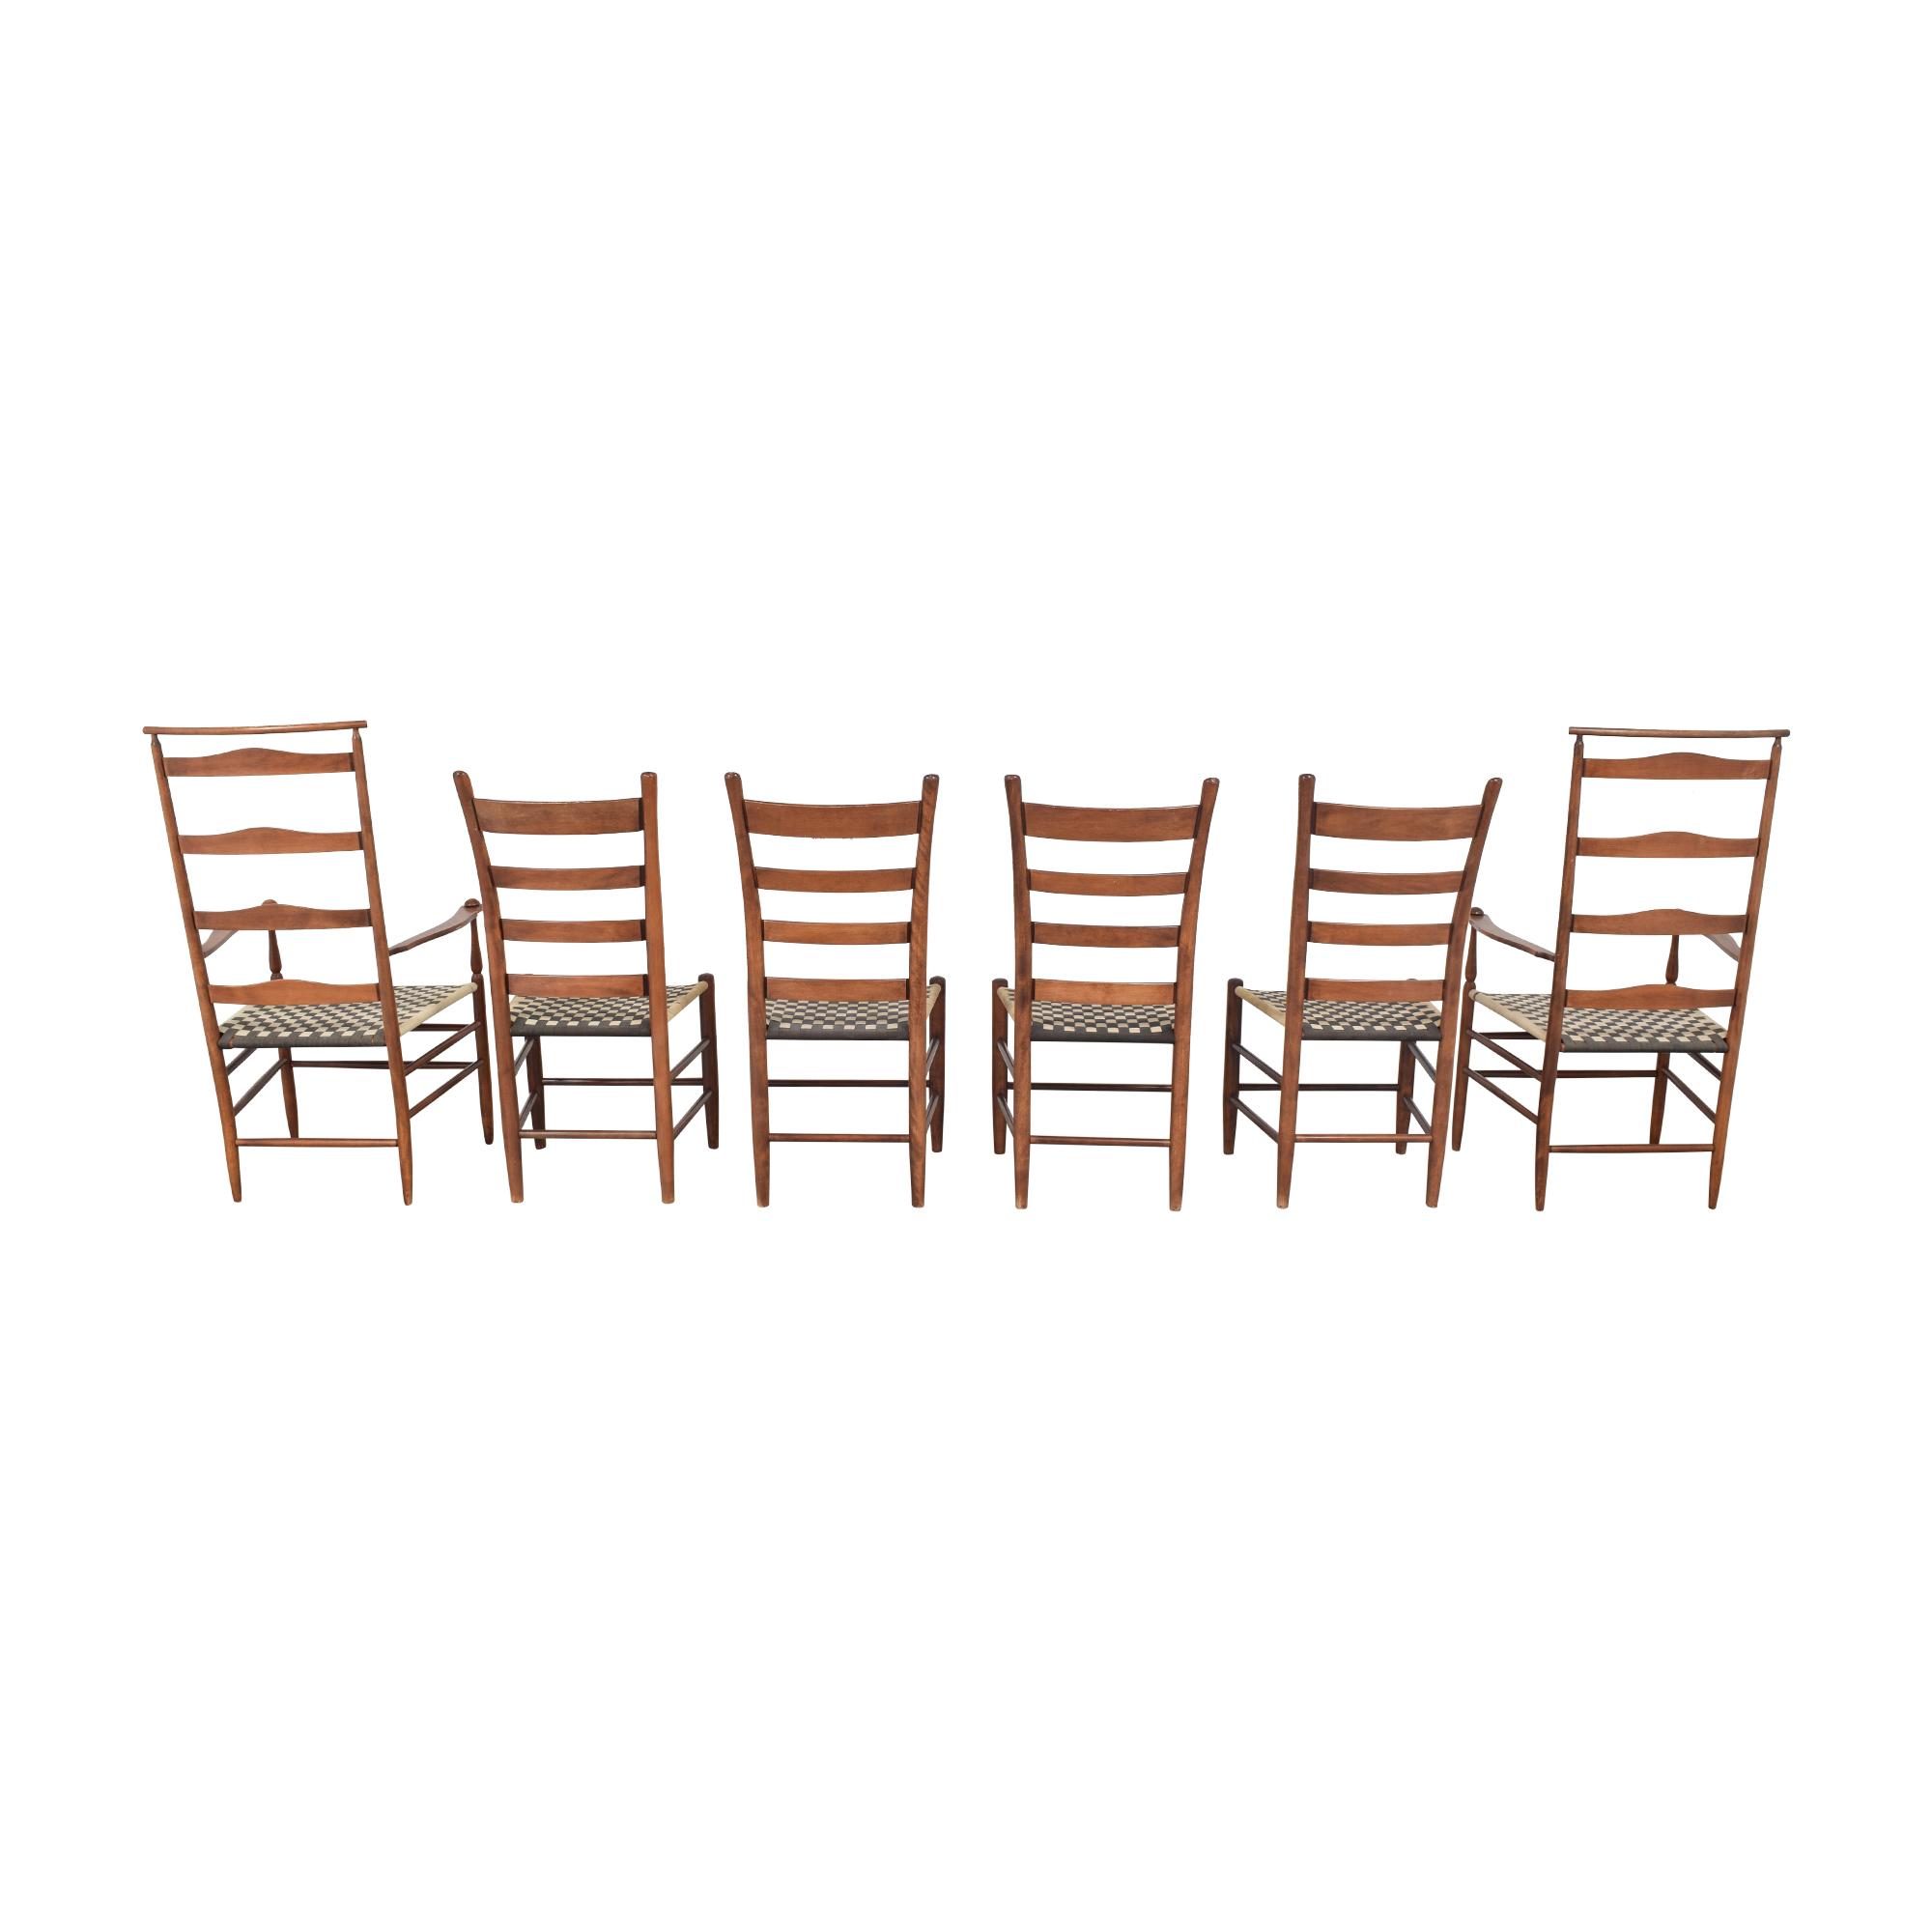 Nichols & Stone Nichols & Stone Ladder Back Dining Chairs second hand